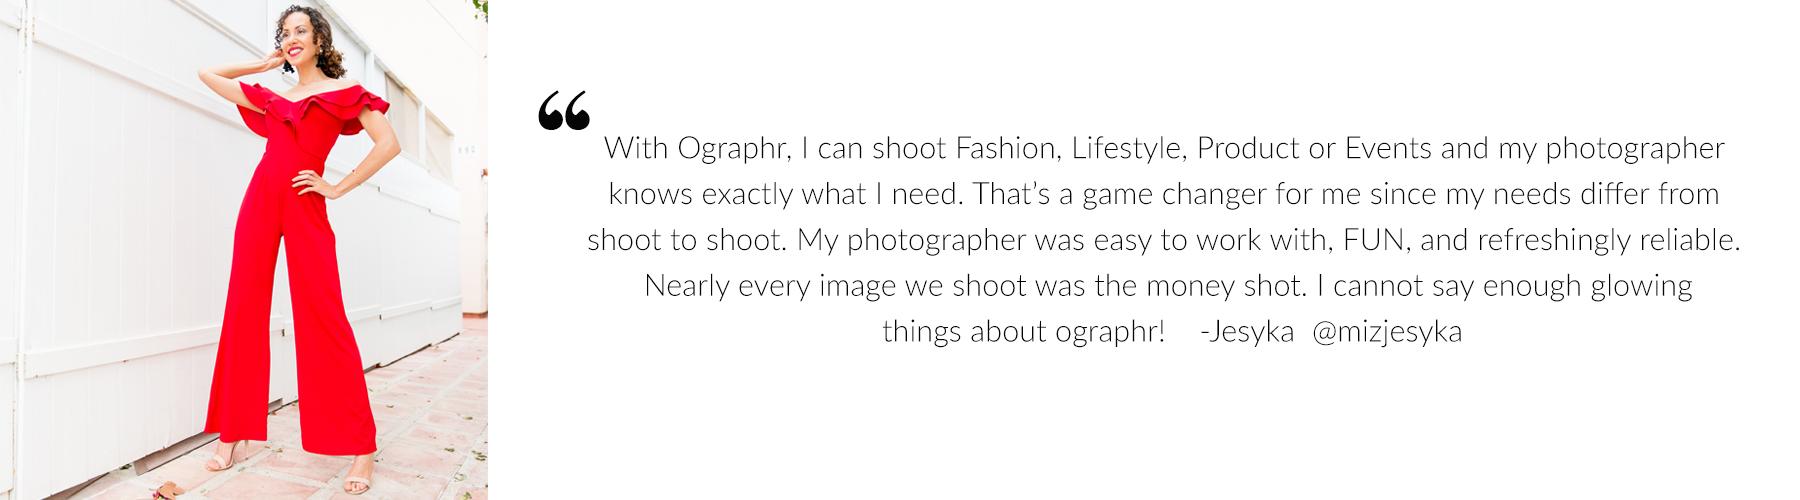 Ographr Review Jesyka.jpg